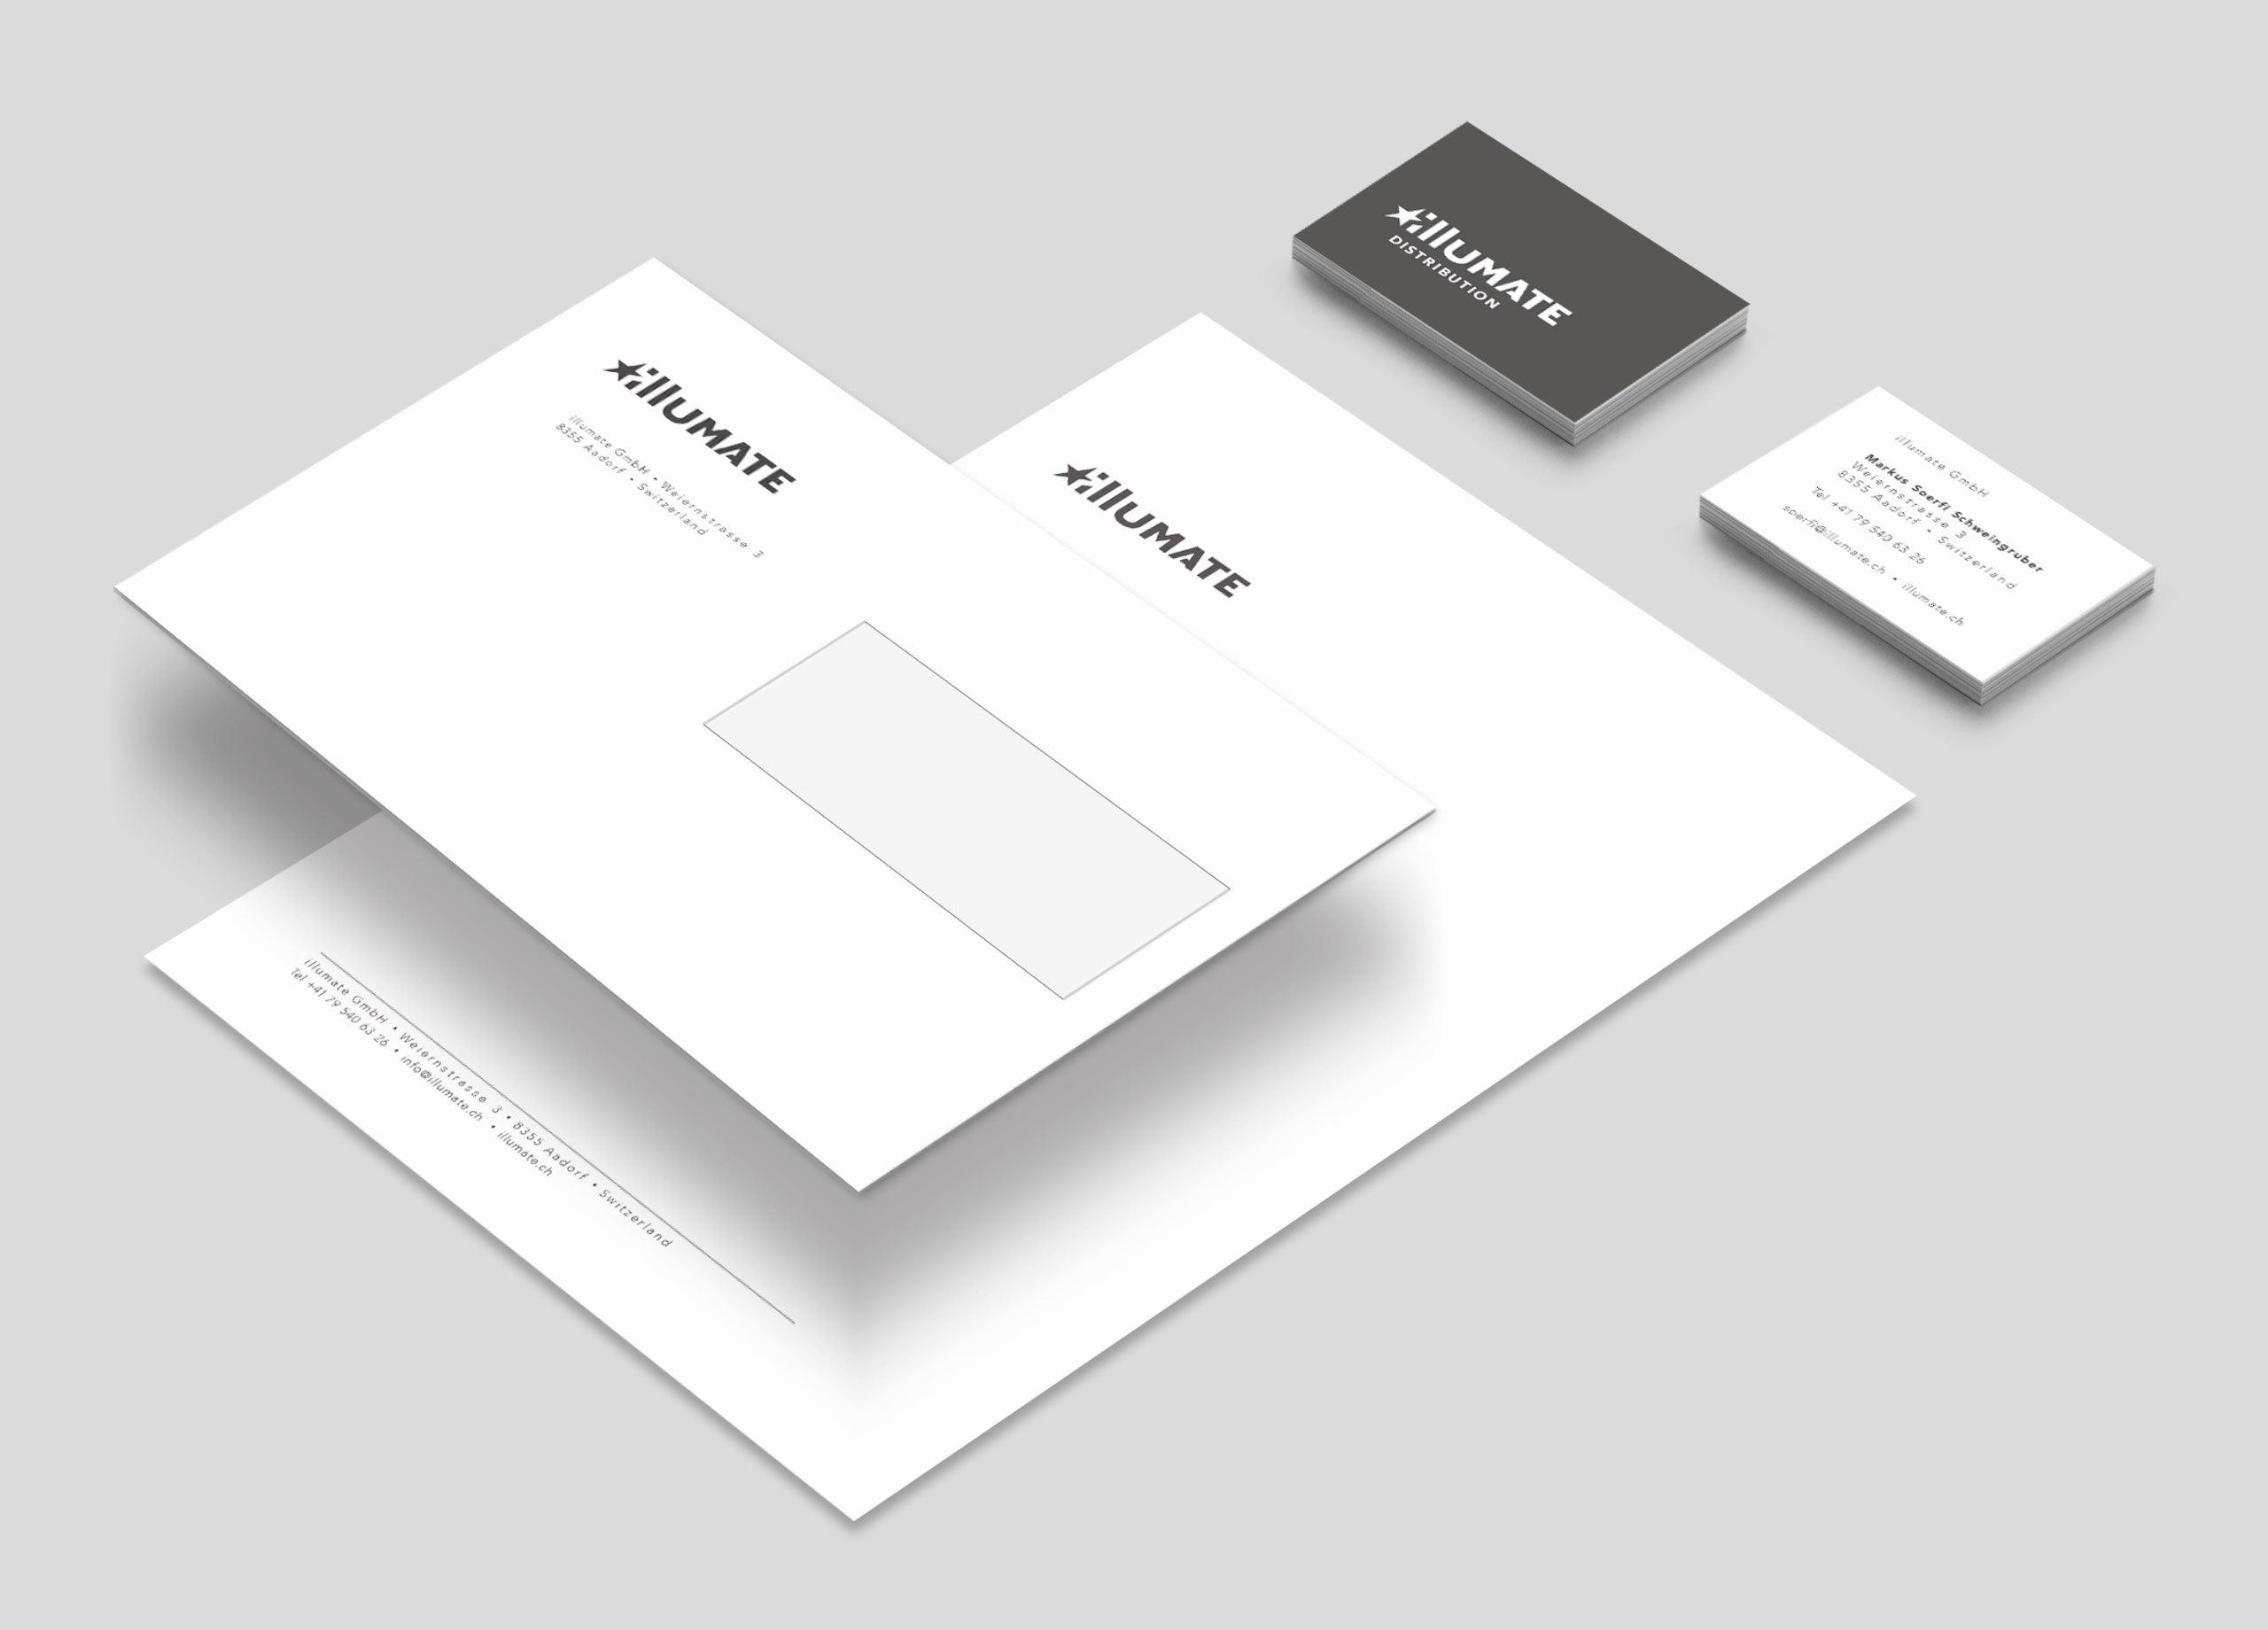 Illumate Corporate Design Briefschaft 01 MHG Bern